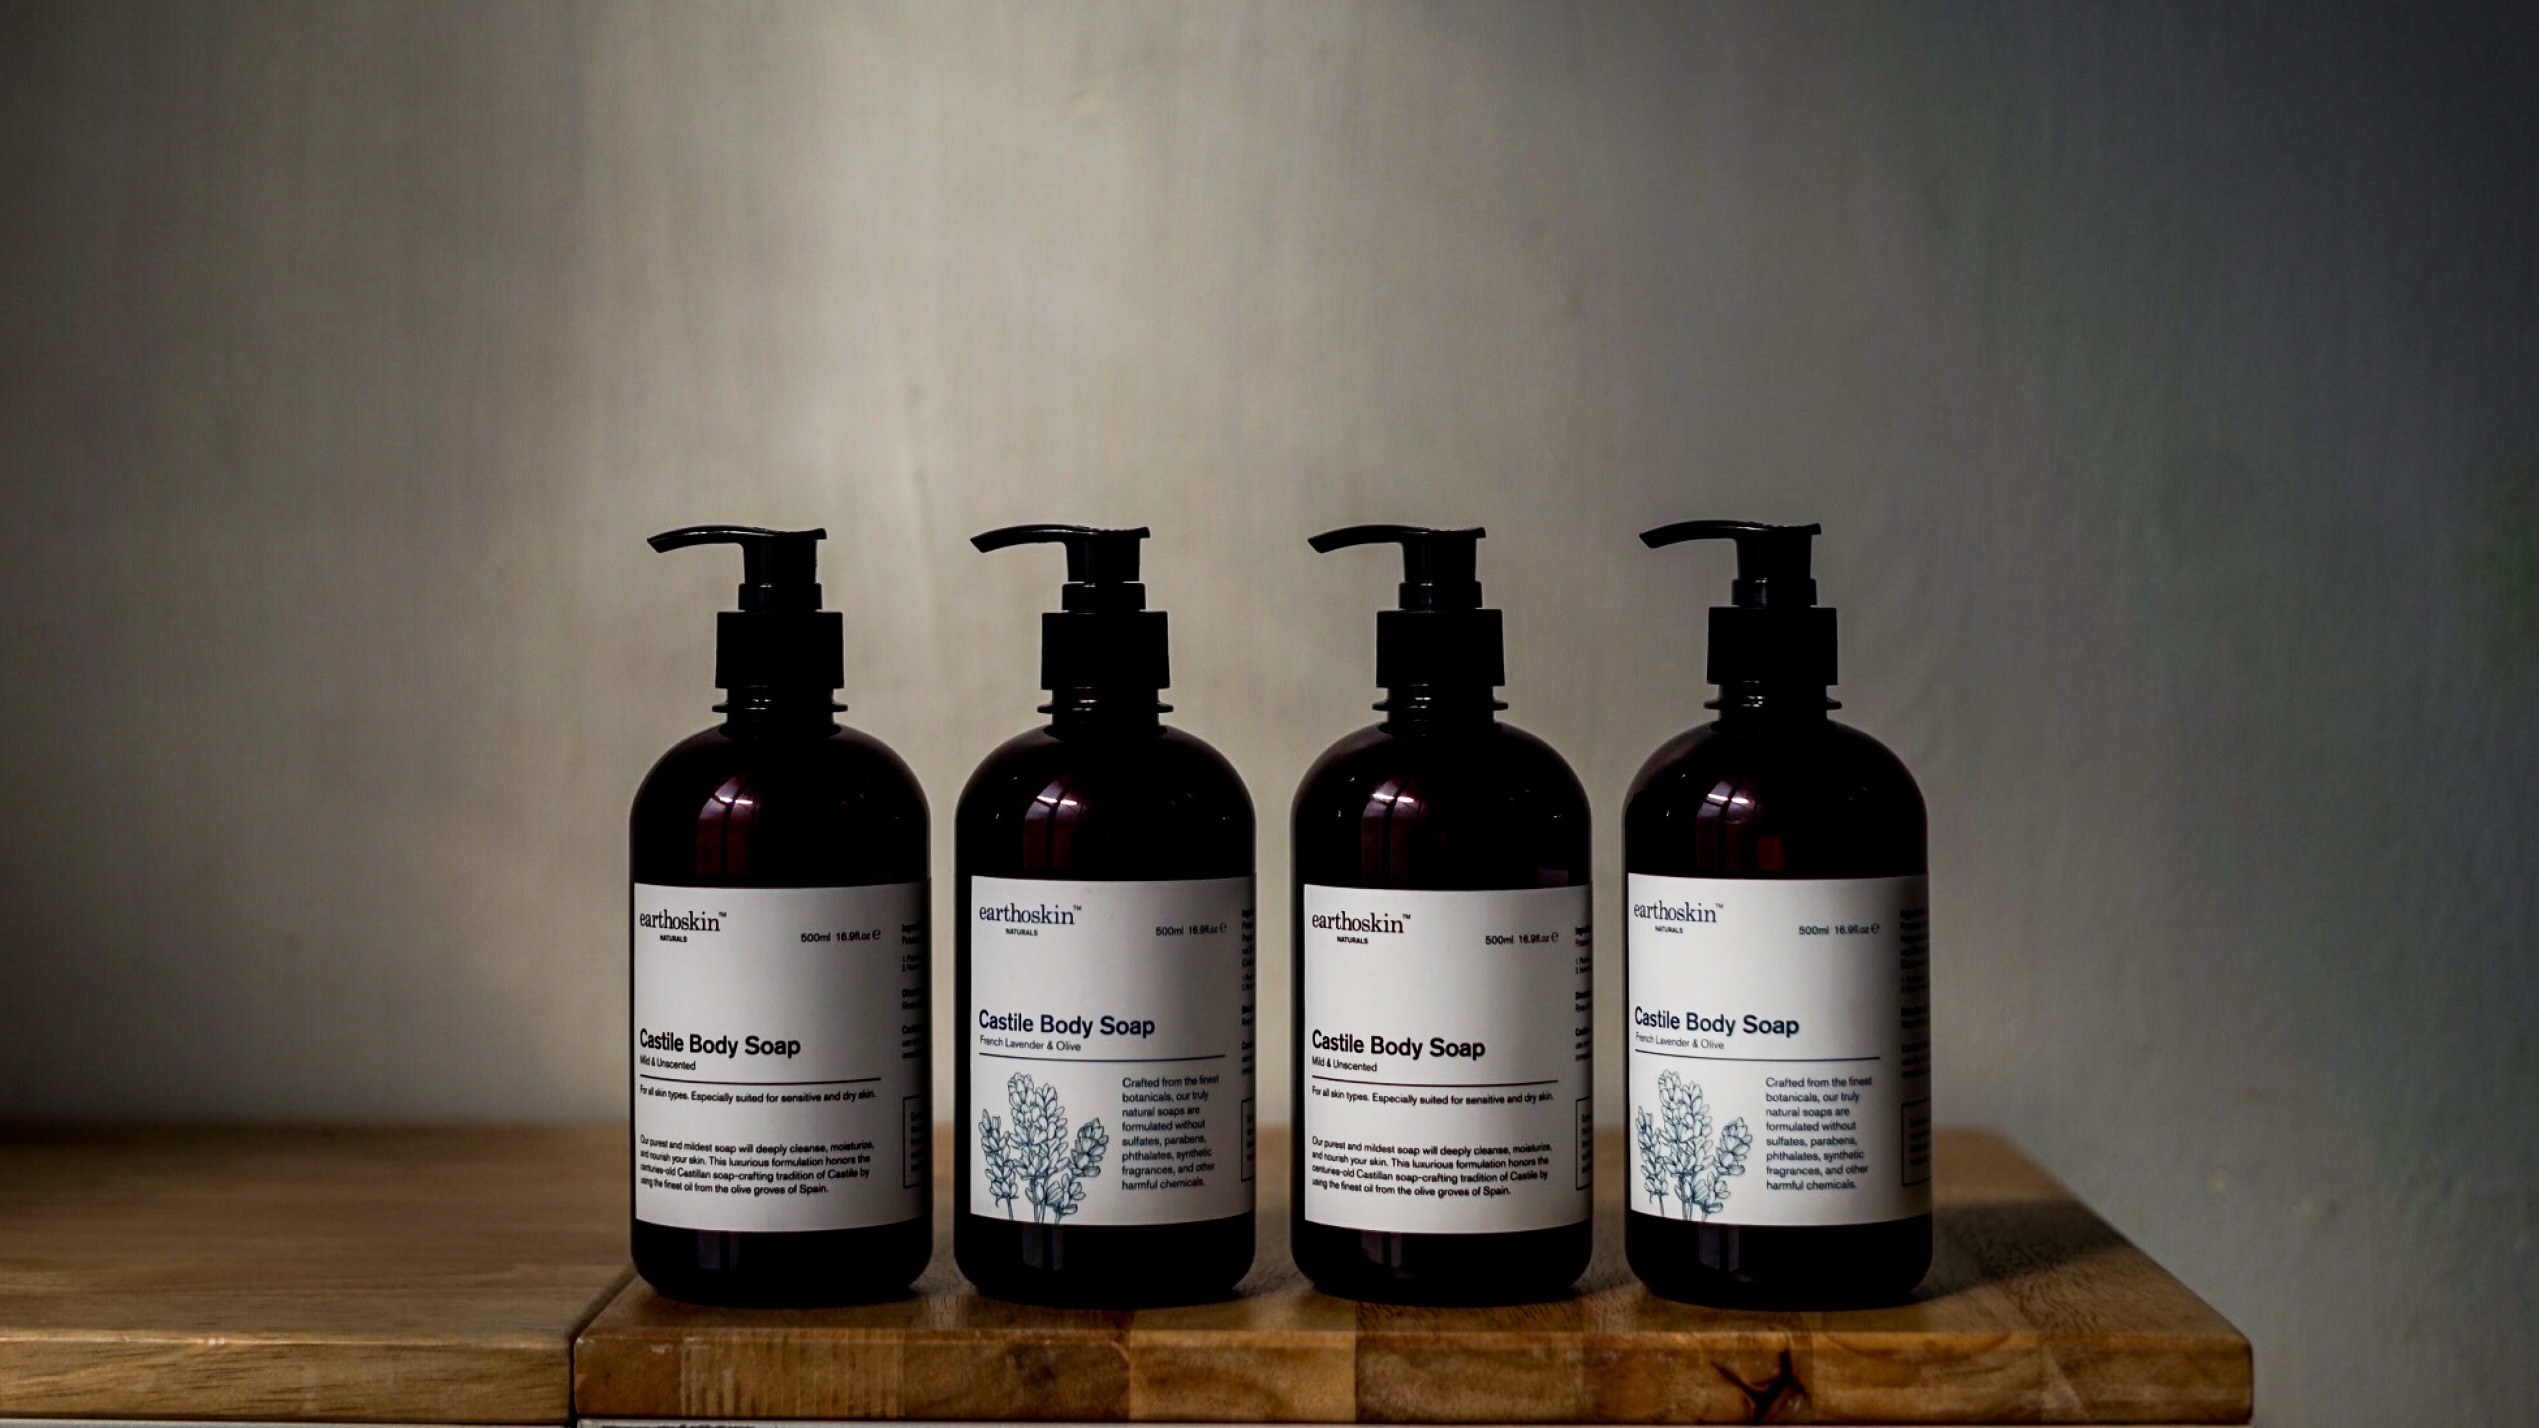 Castile Body Soap Collection